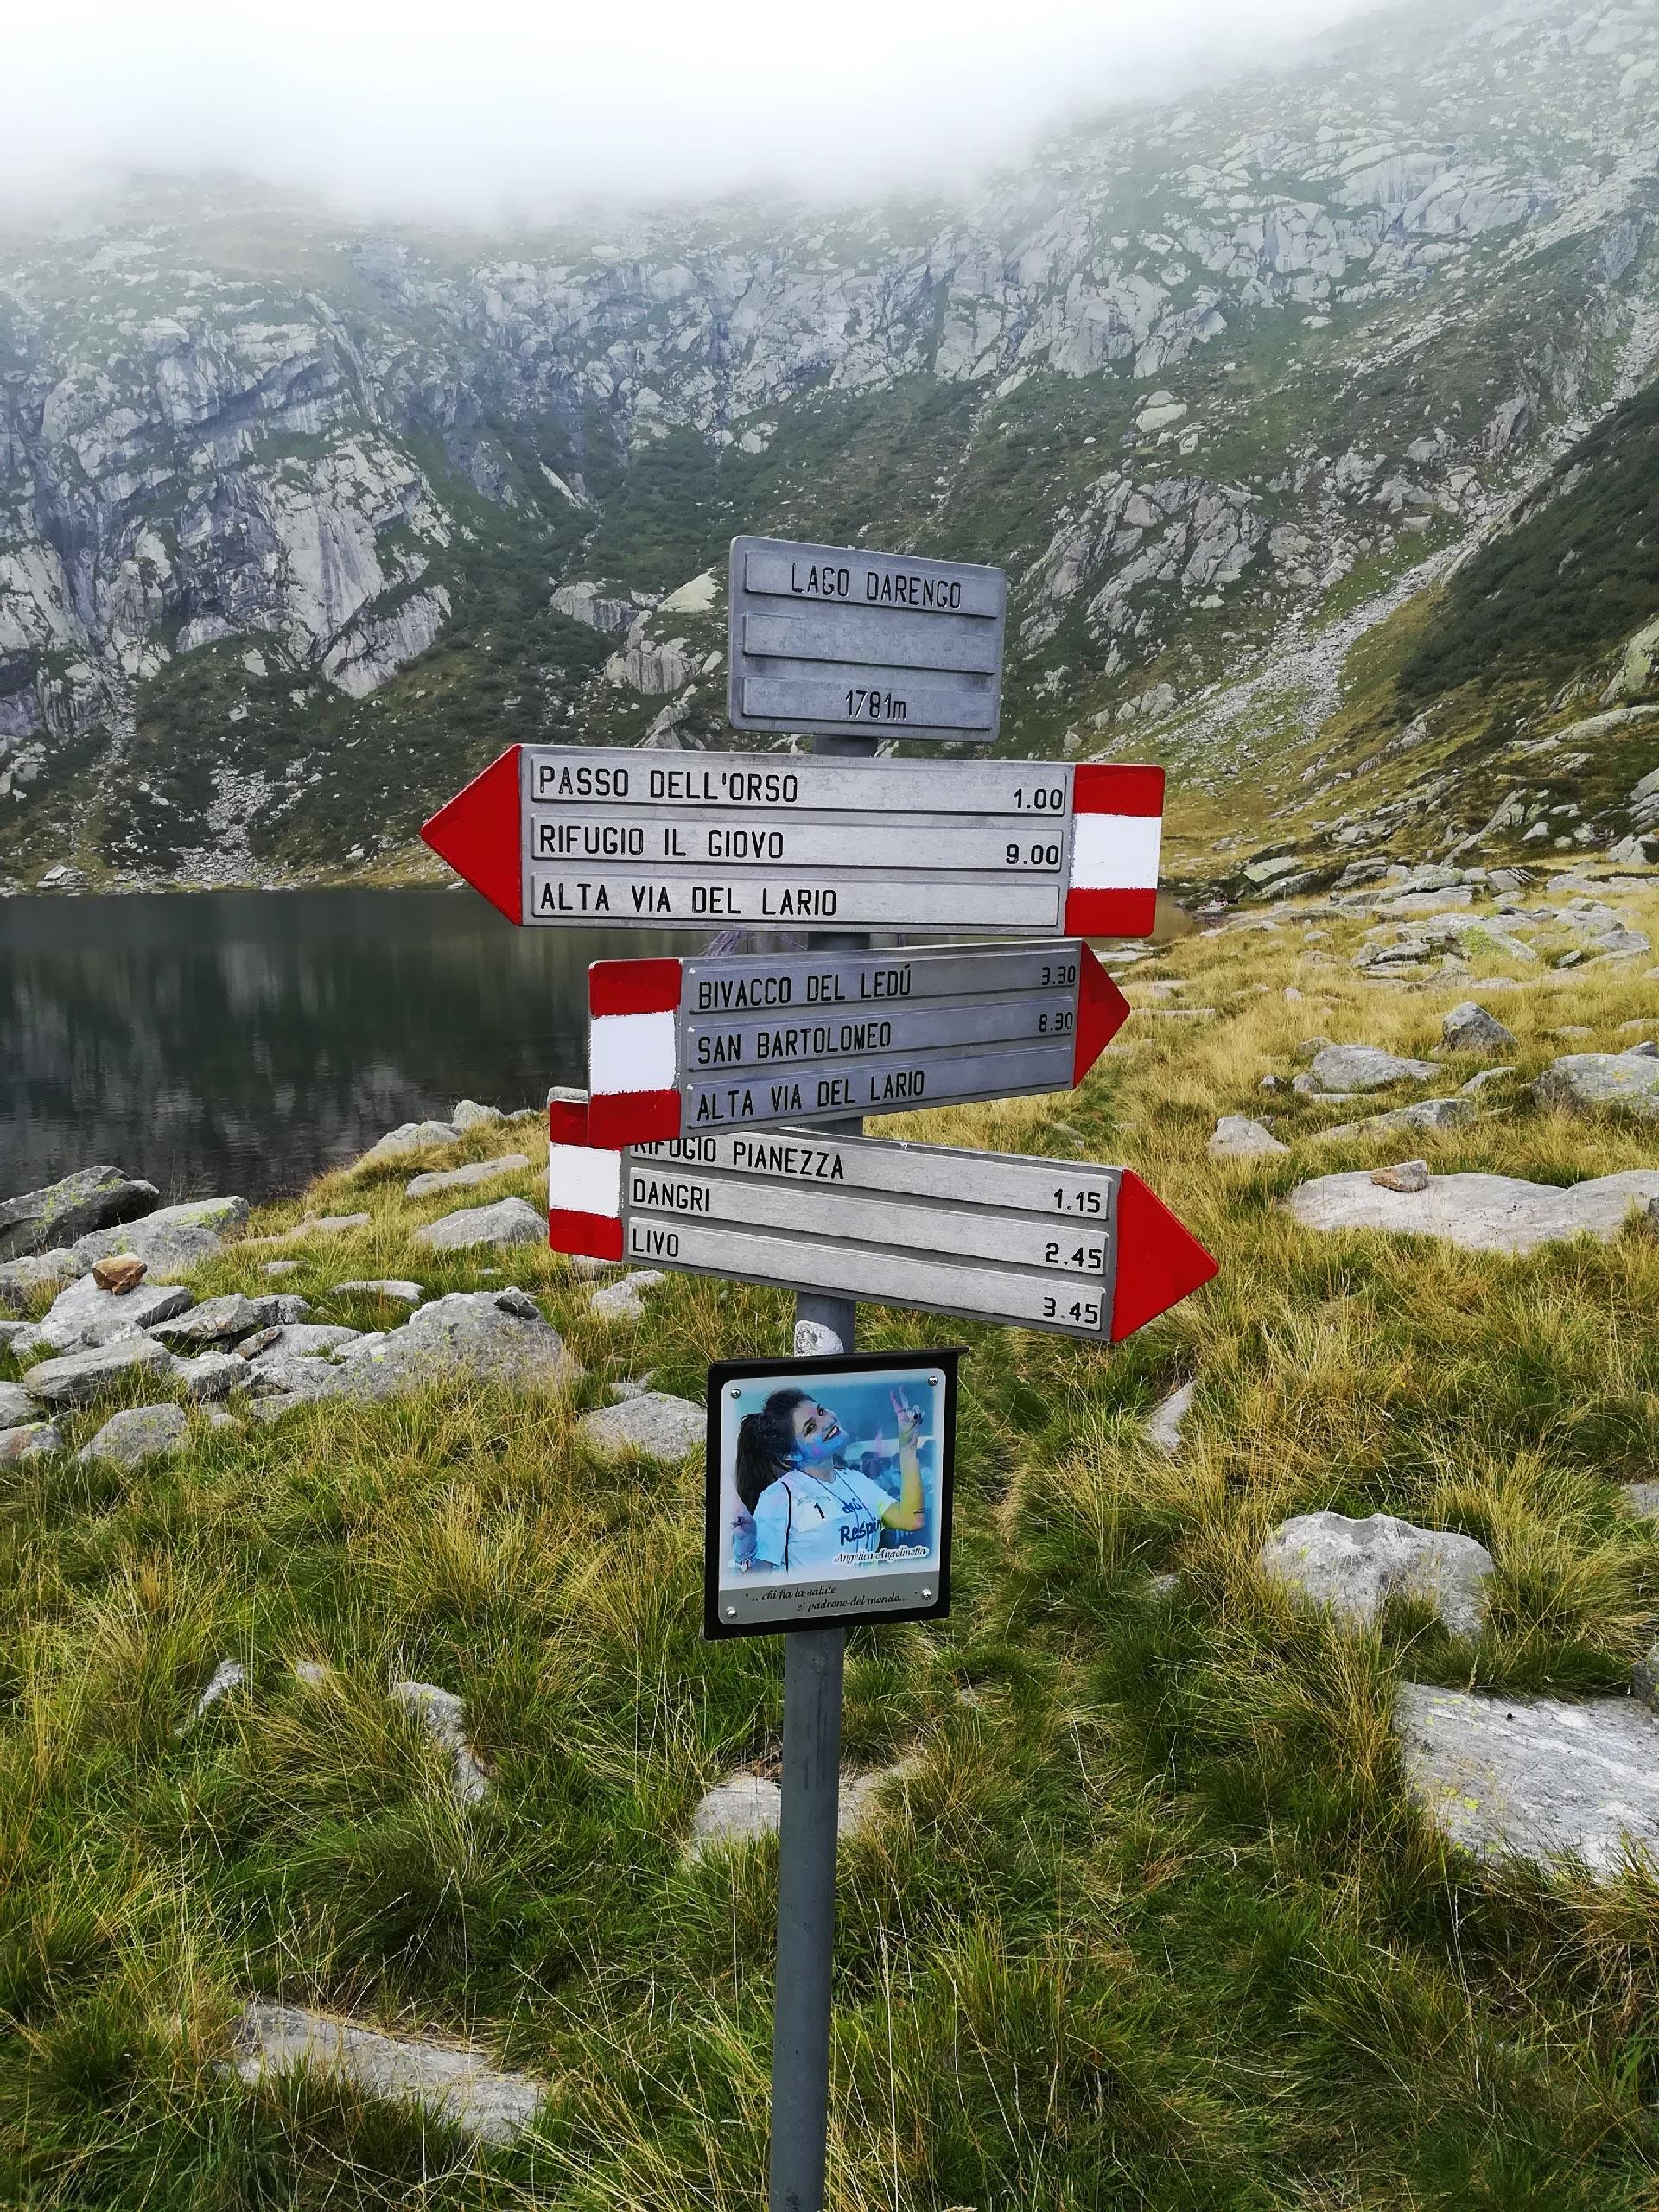 indicazioni nei pressi del lago Darengo, Como, Lombardia